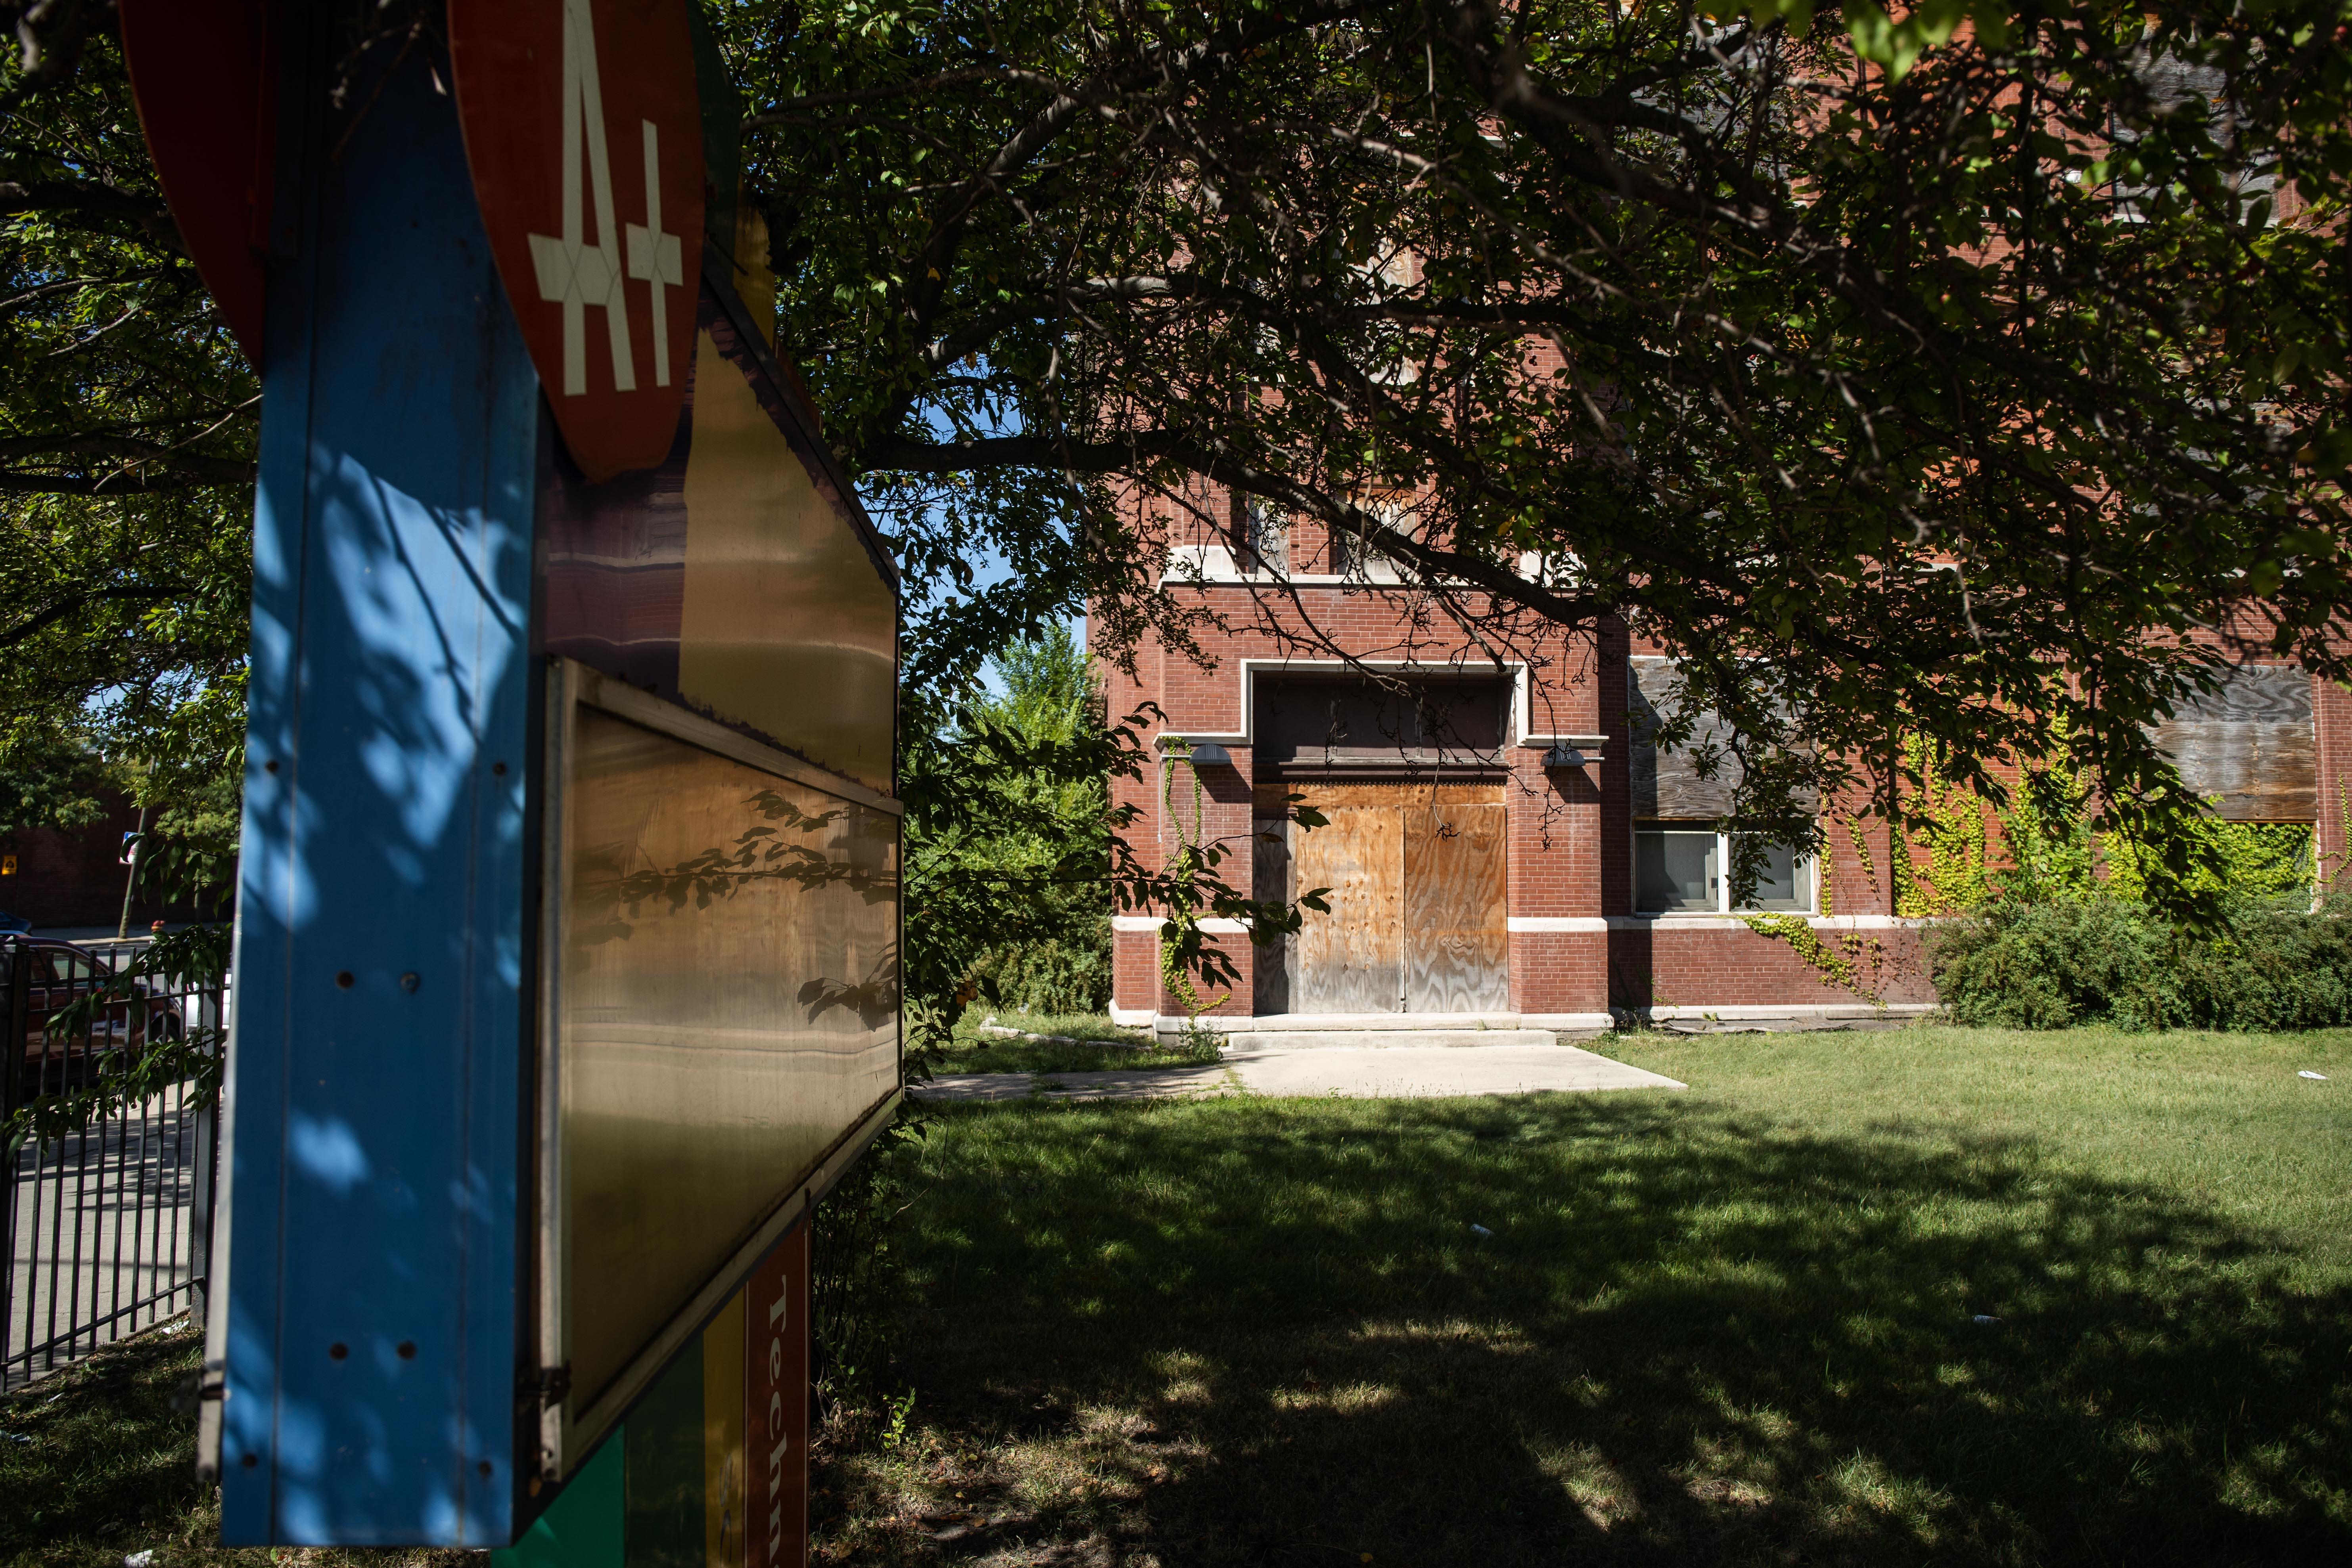 The former Robert Emmet Elementary School, 5500 W. Madison St., in the Austin neighborhood.